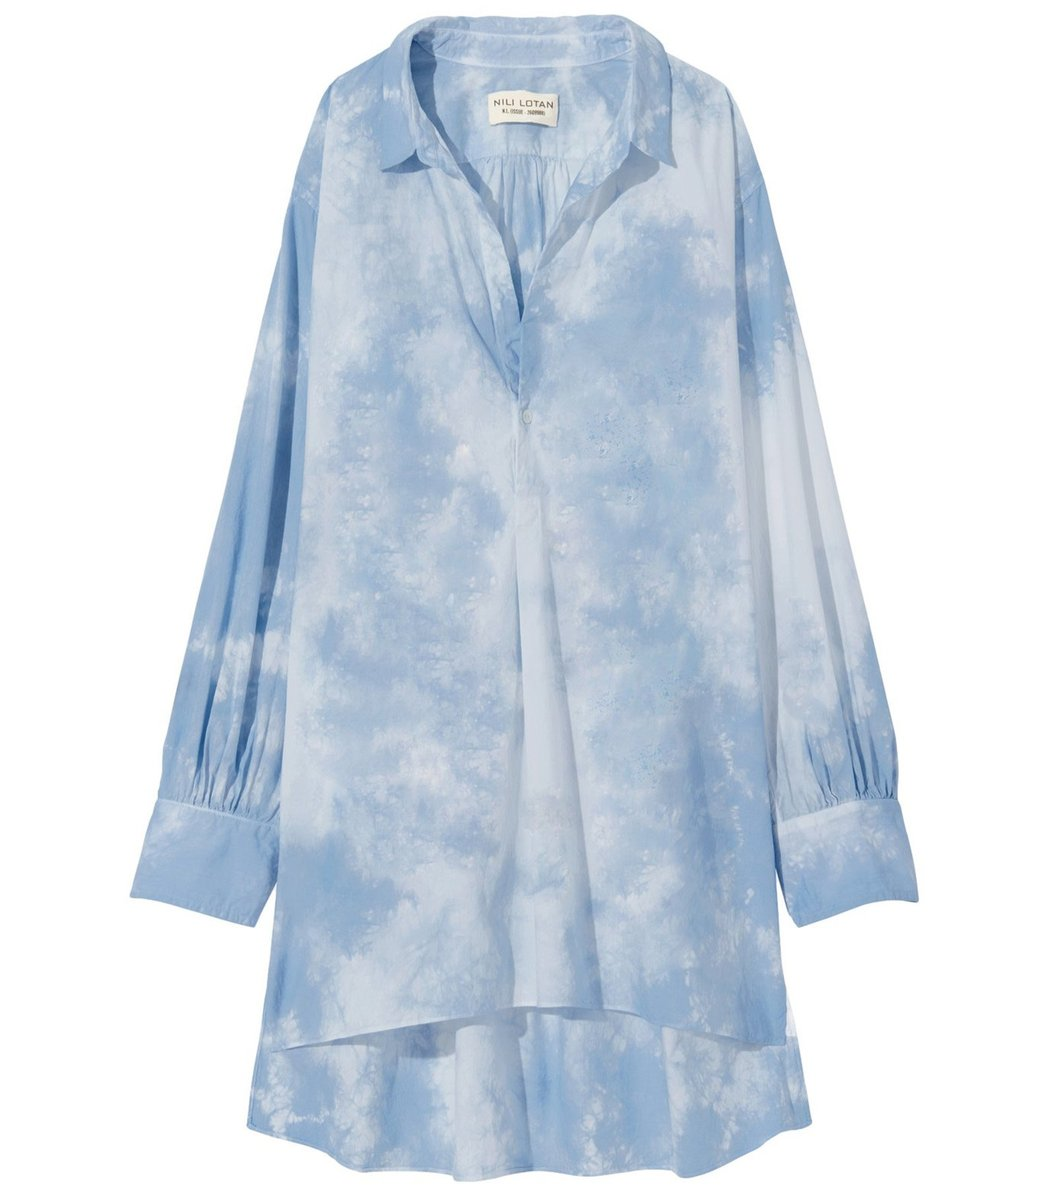 Nili Lotan Ambrose Tunic in Light Blue Tie Dye